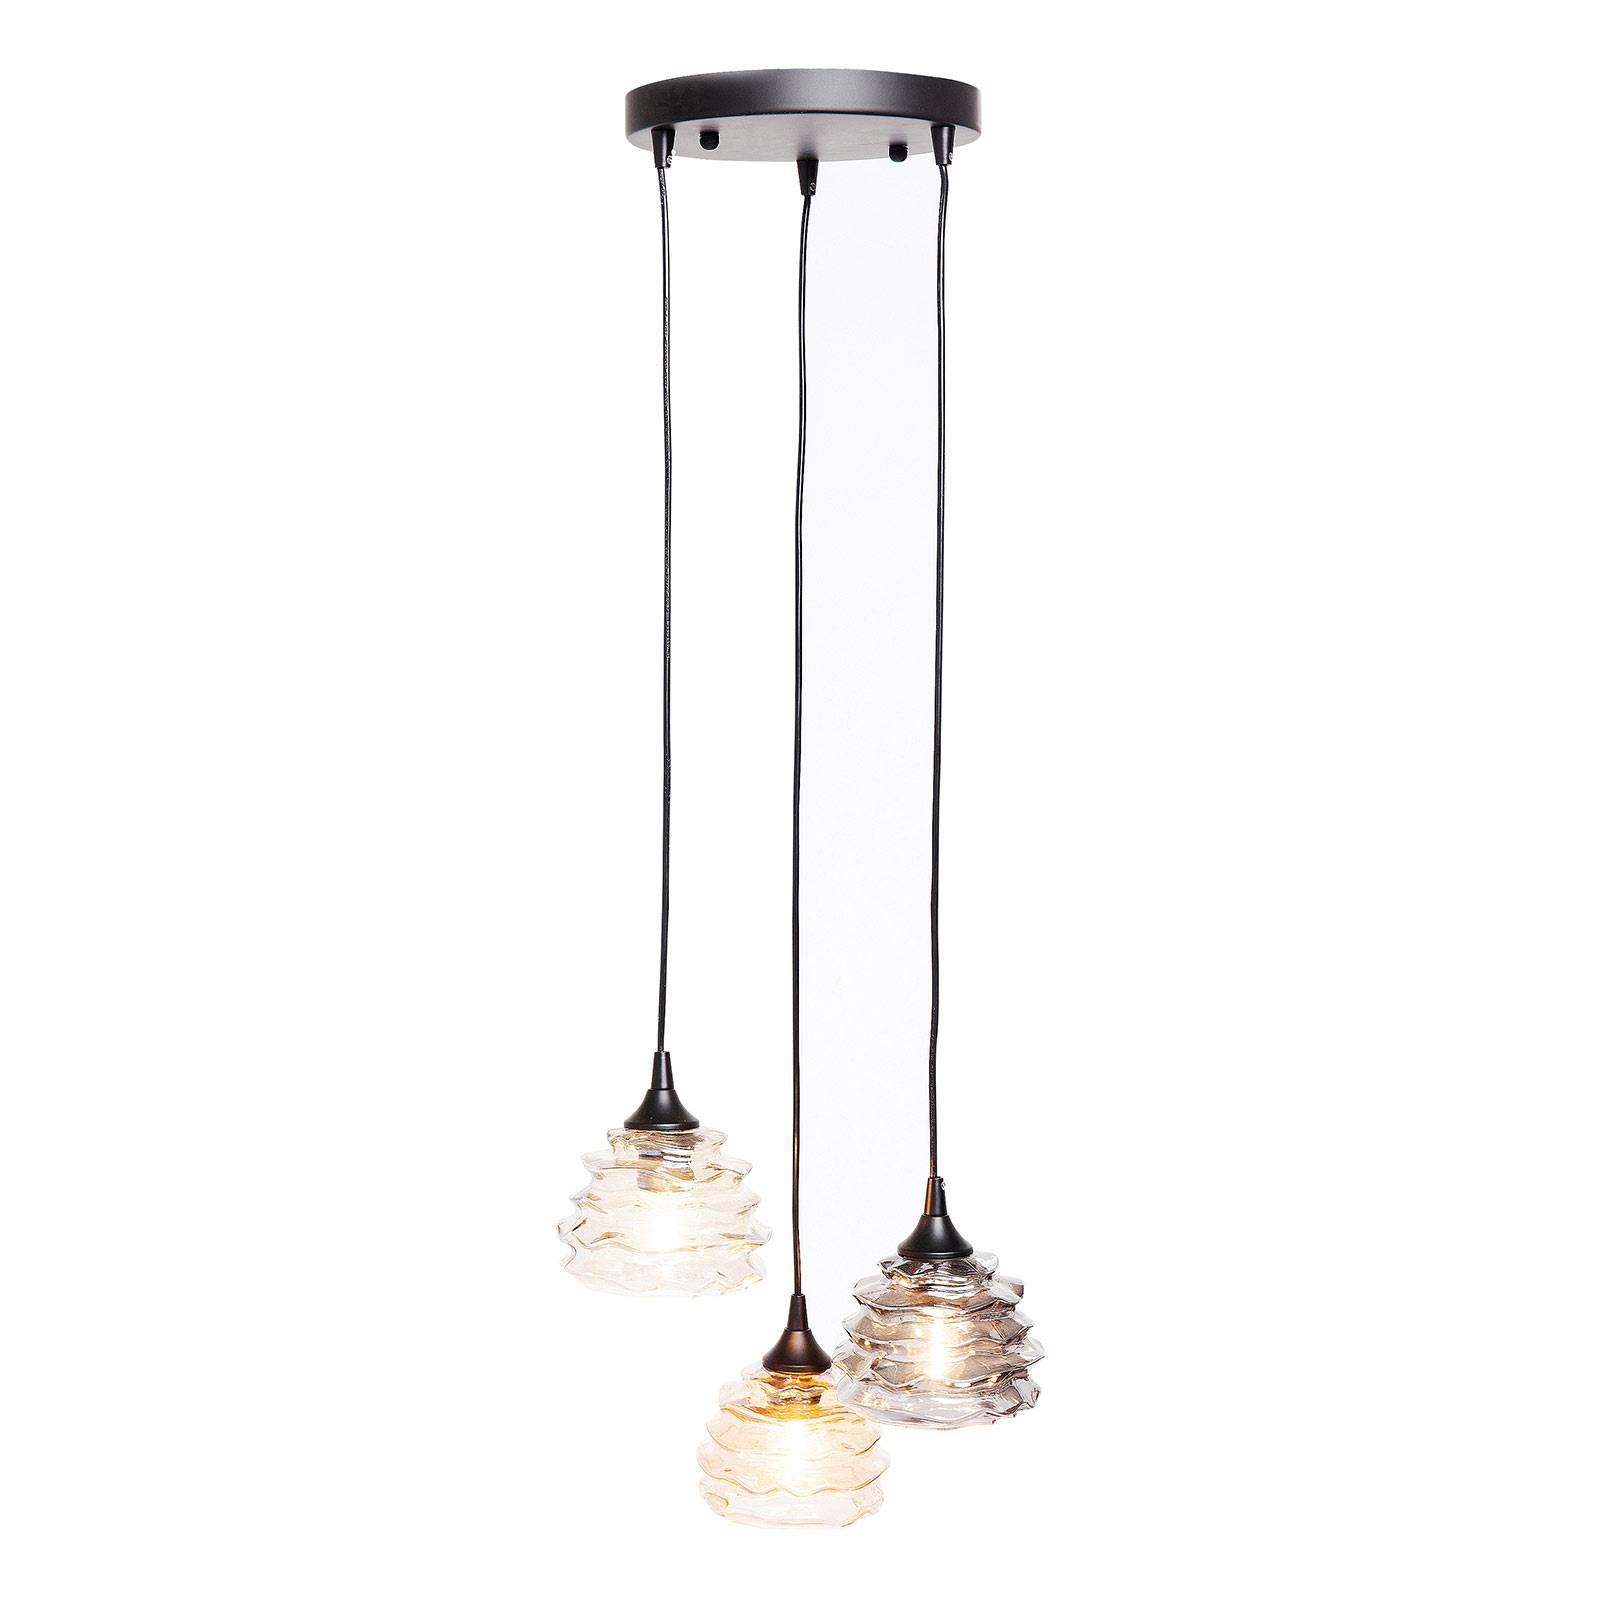 KARE Ruffle Visible hanglamp 3-lamps rond